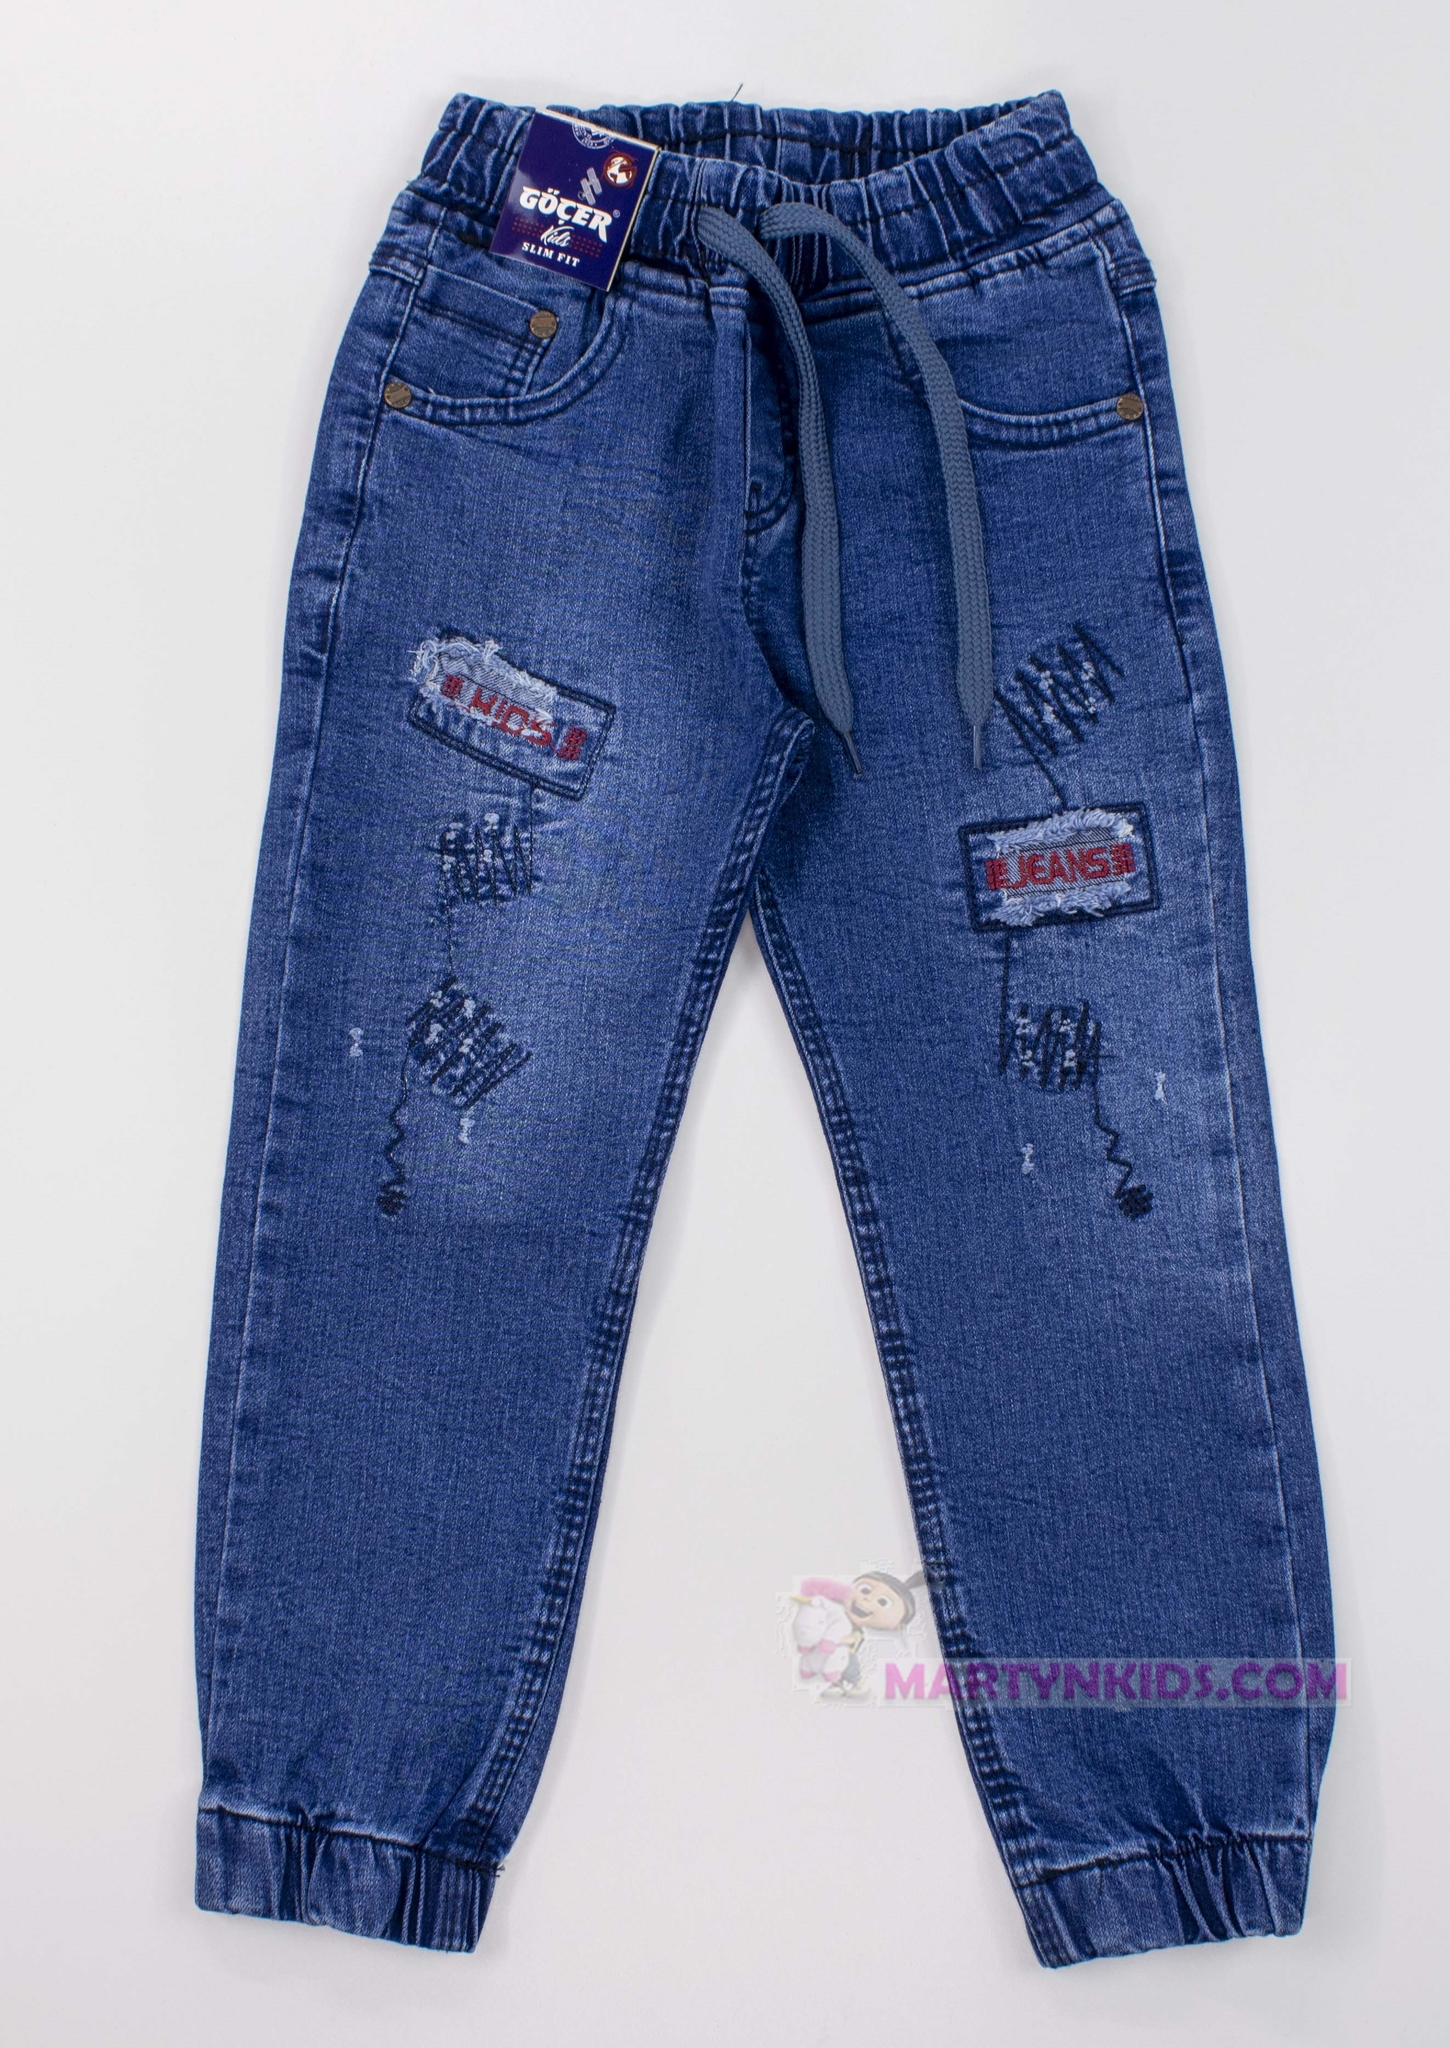 3382 джинсы - джогеры